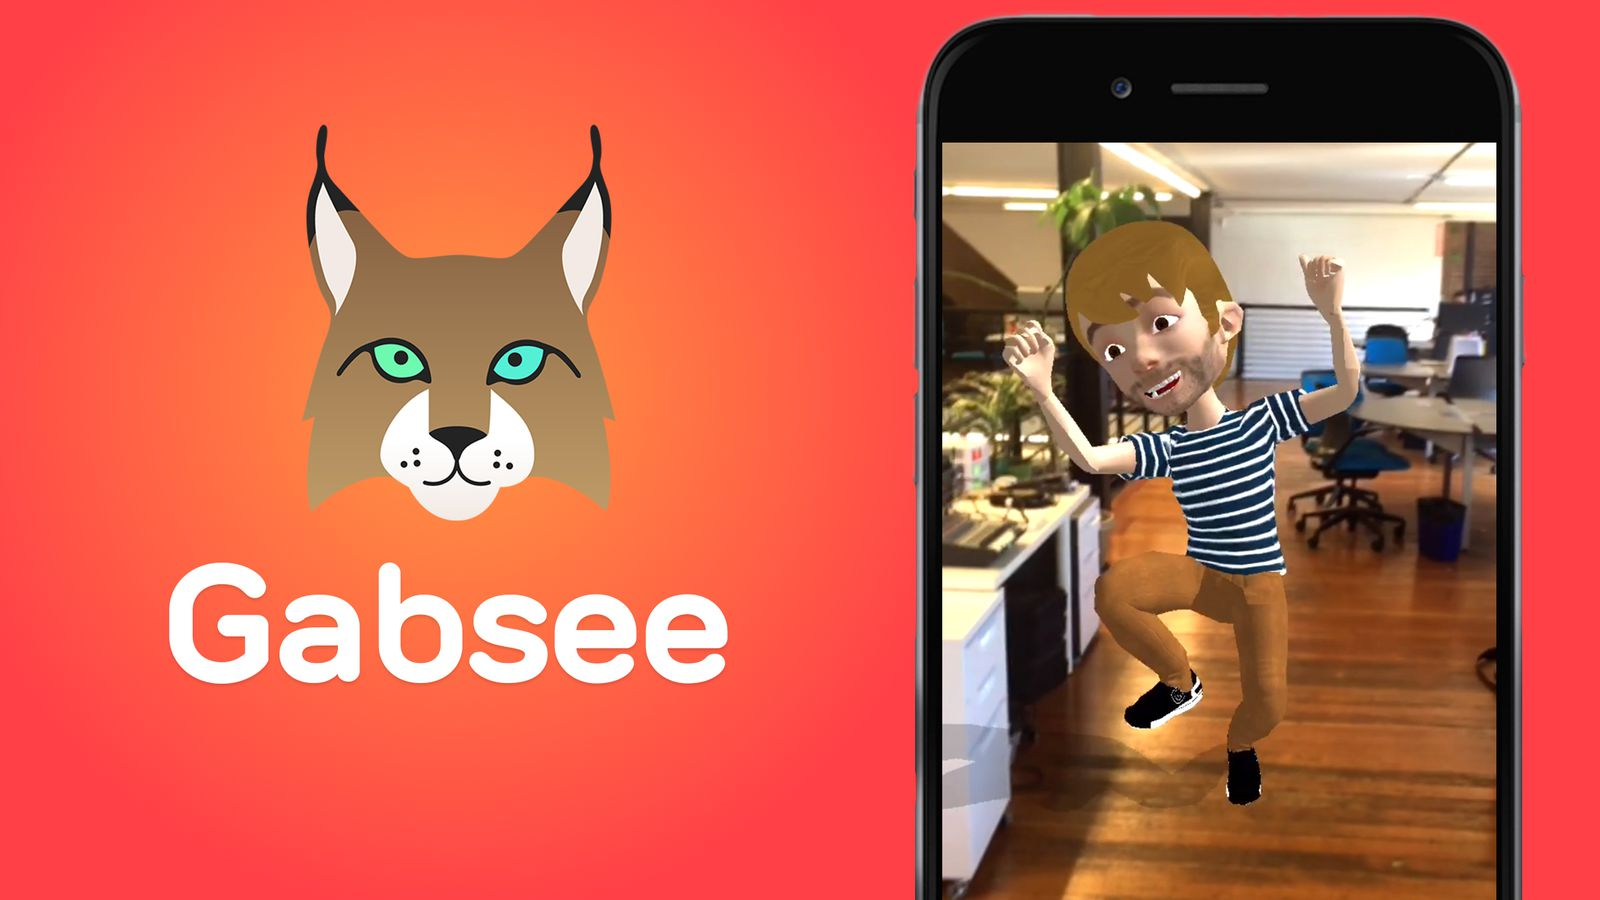 Gabsee's charming 3D avatars are the Bitmoji of the future